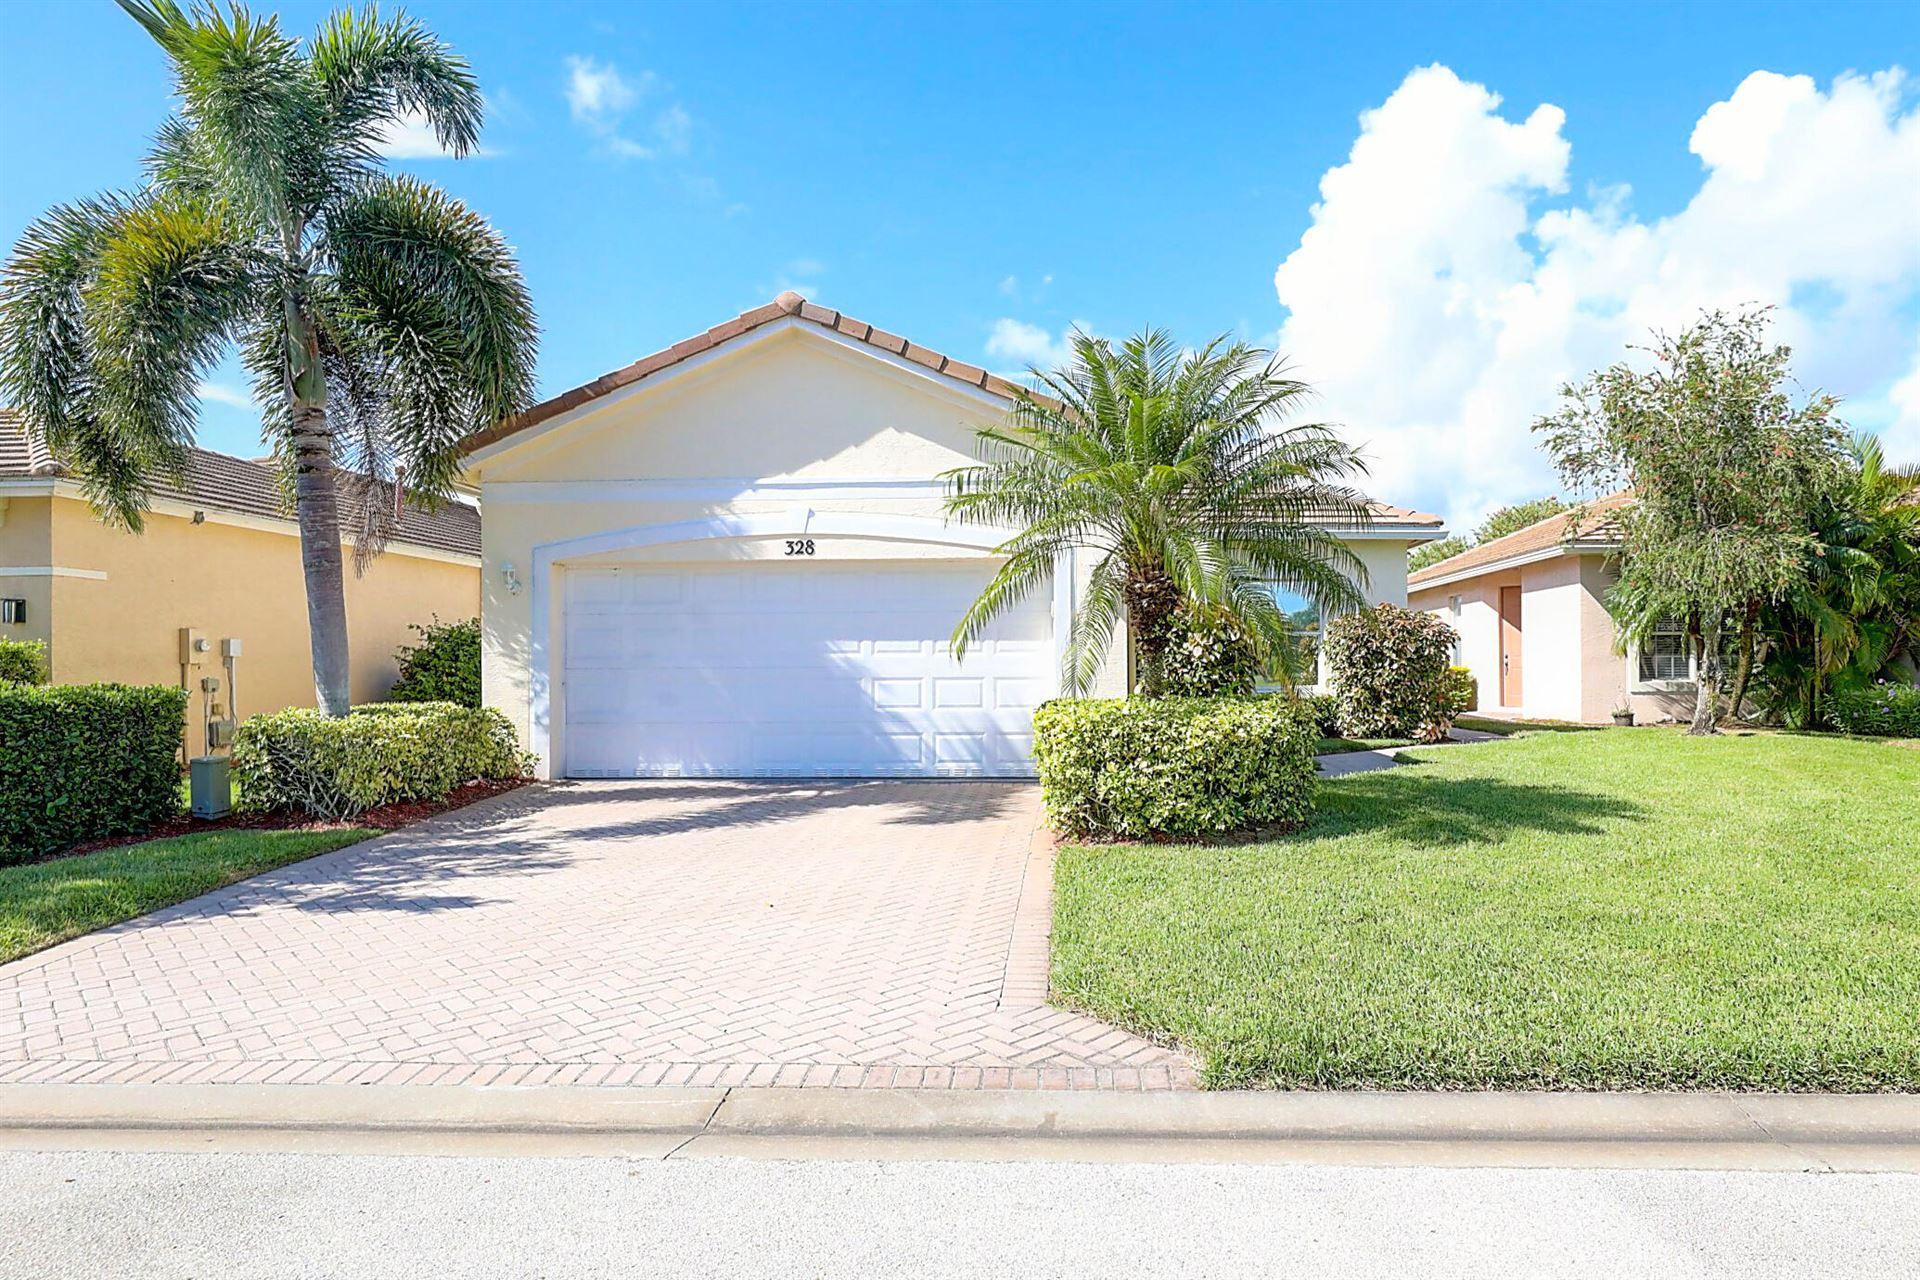 328 SW Tomoka Springs Drive, Port Saint Lucie, FL 34986 - #: RX-10753560